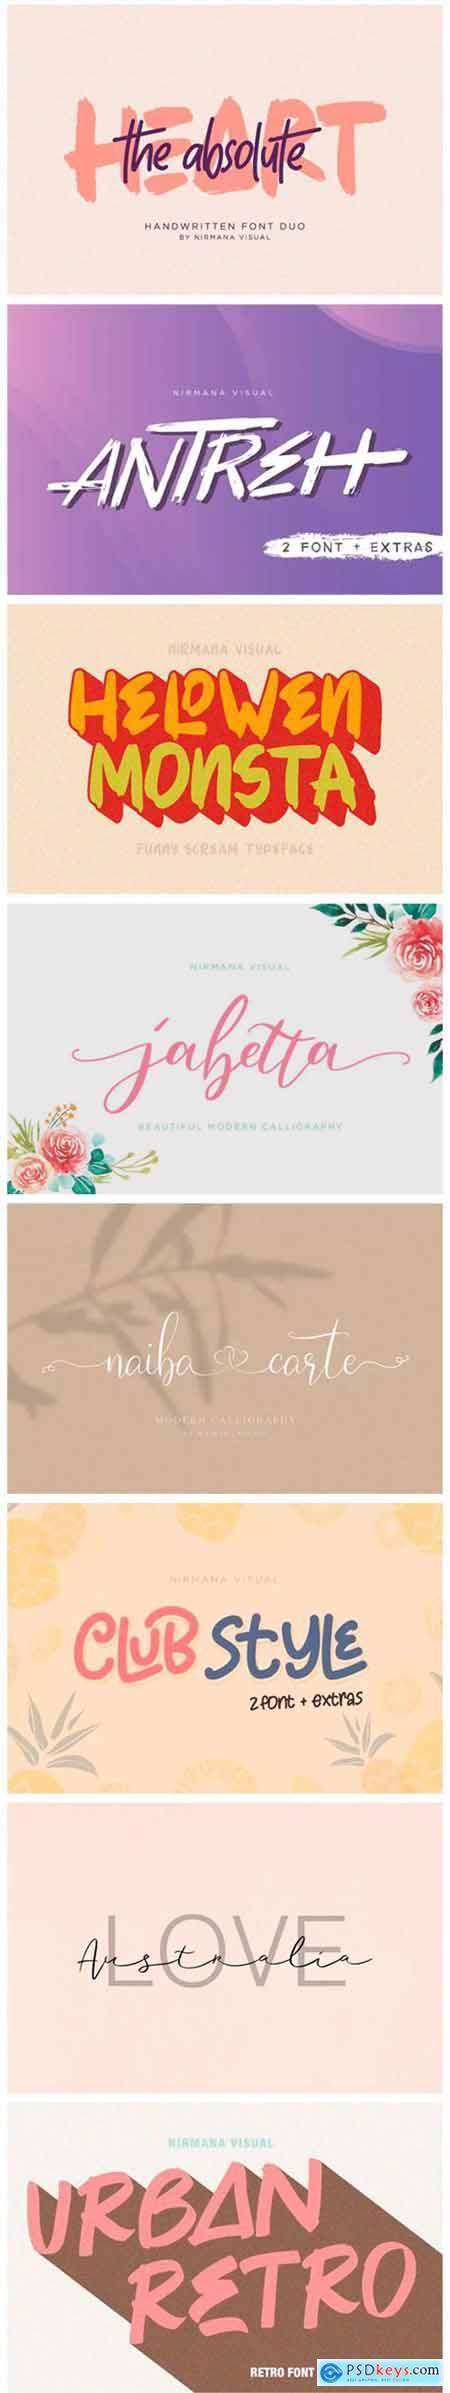 8 Gorgeous Fonts